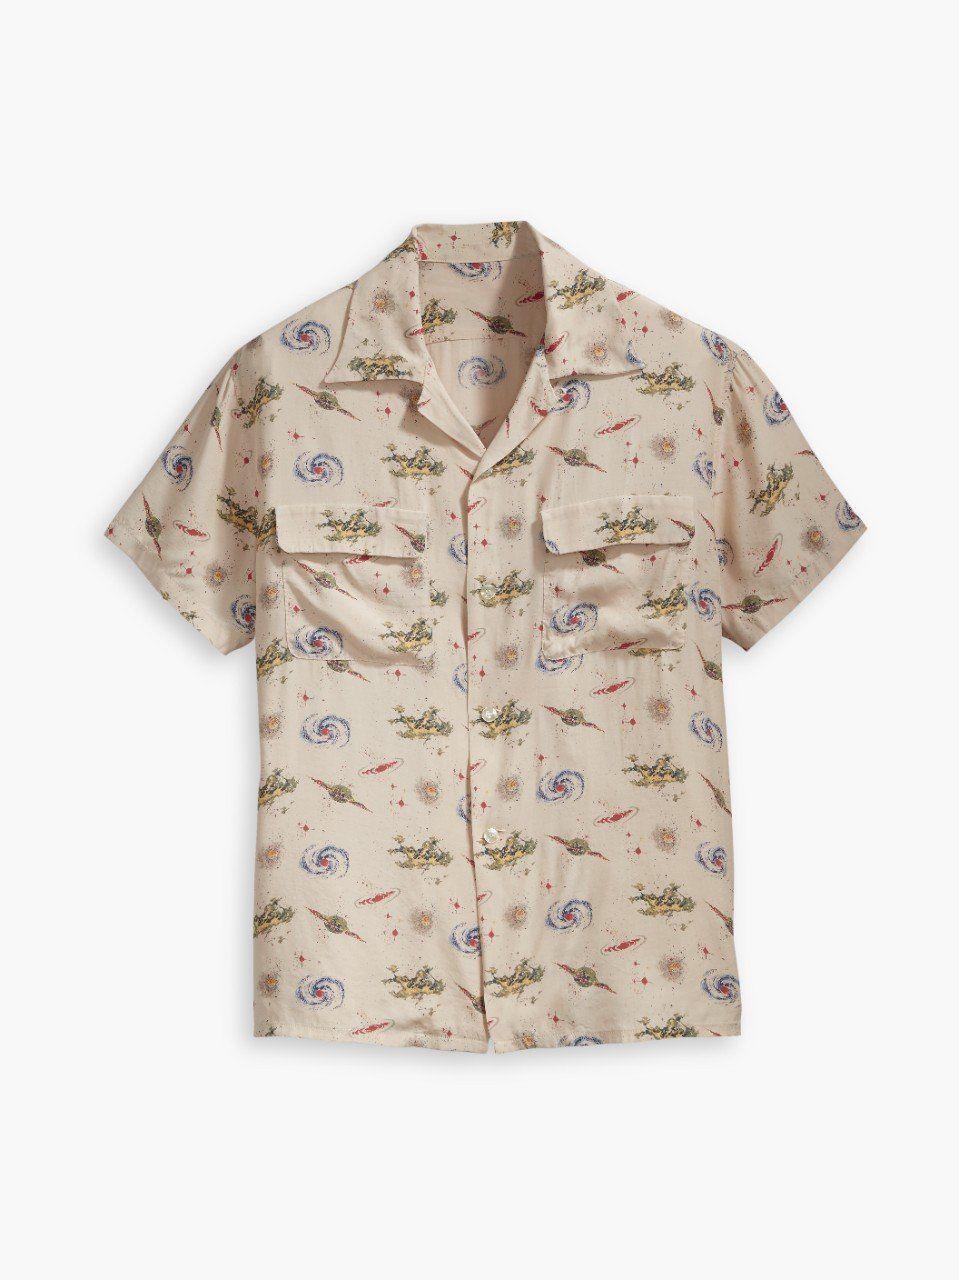 06edb94e Levis Vintage 1940's Hawaiian Shirt Universe // Beige | Products ...